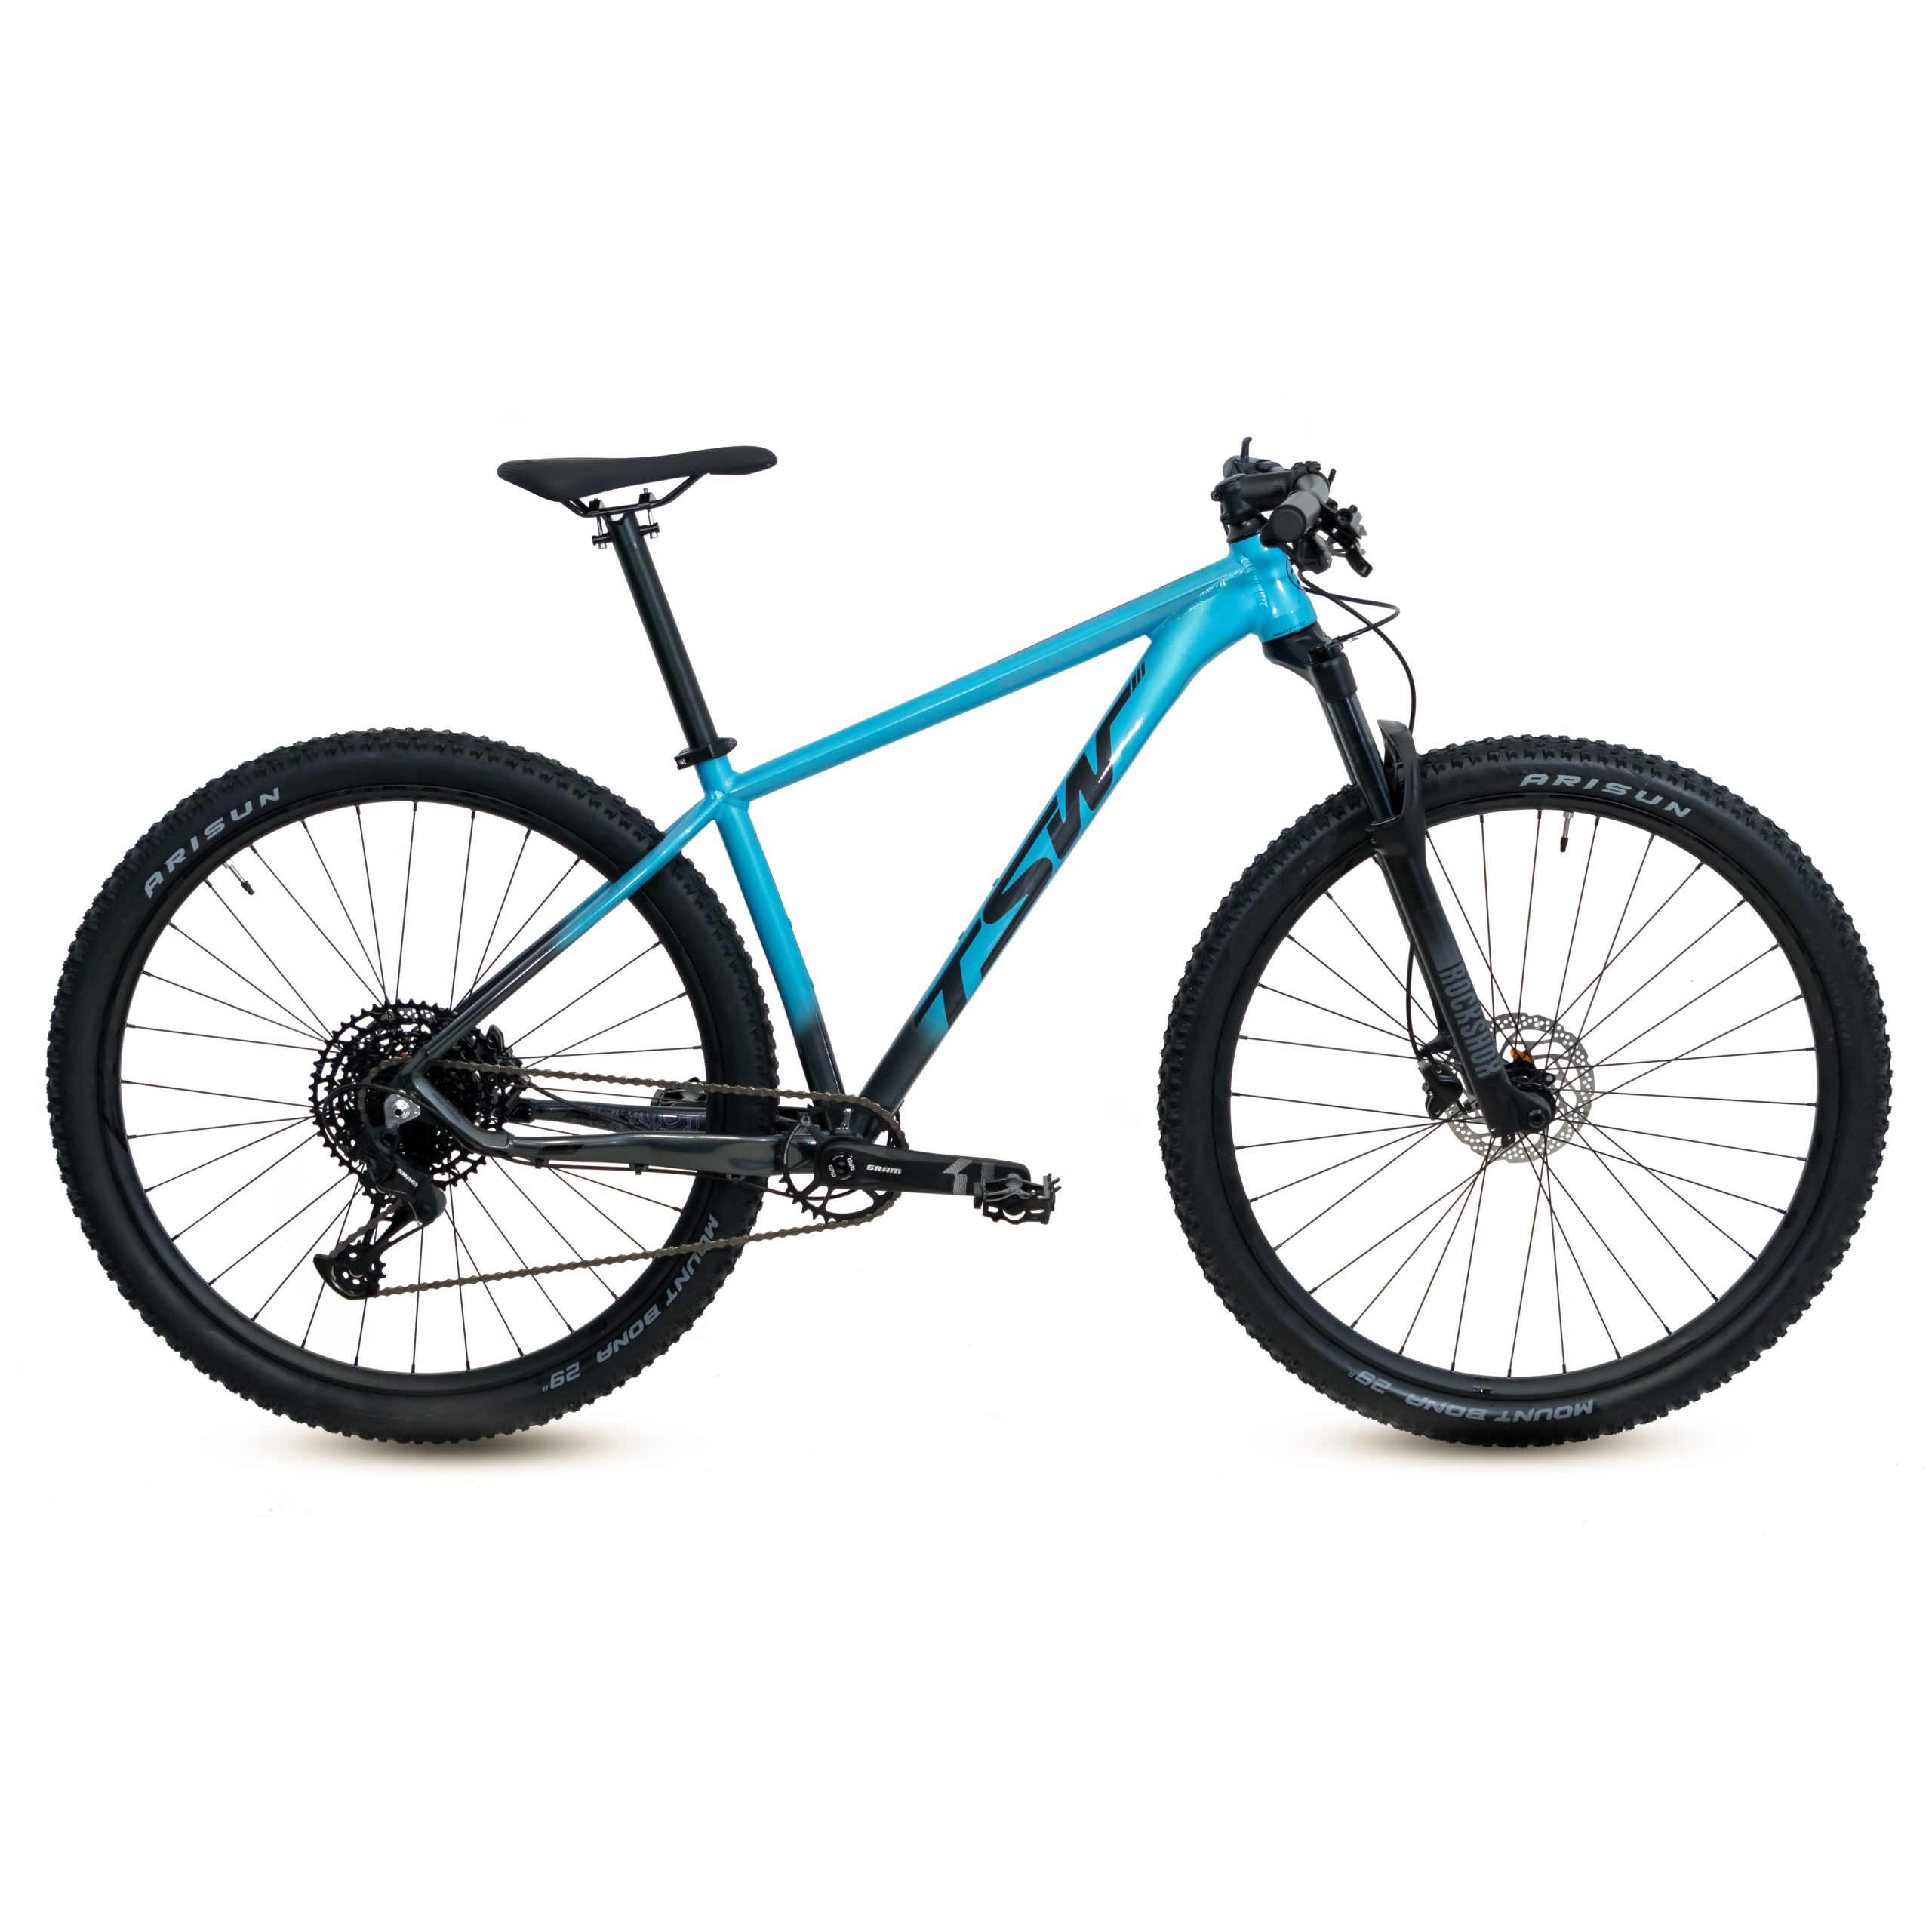 Bicicleta TSW Yukon   SM-12   2021/2022 4